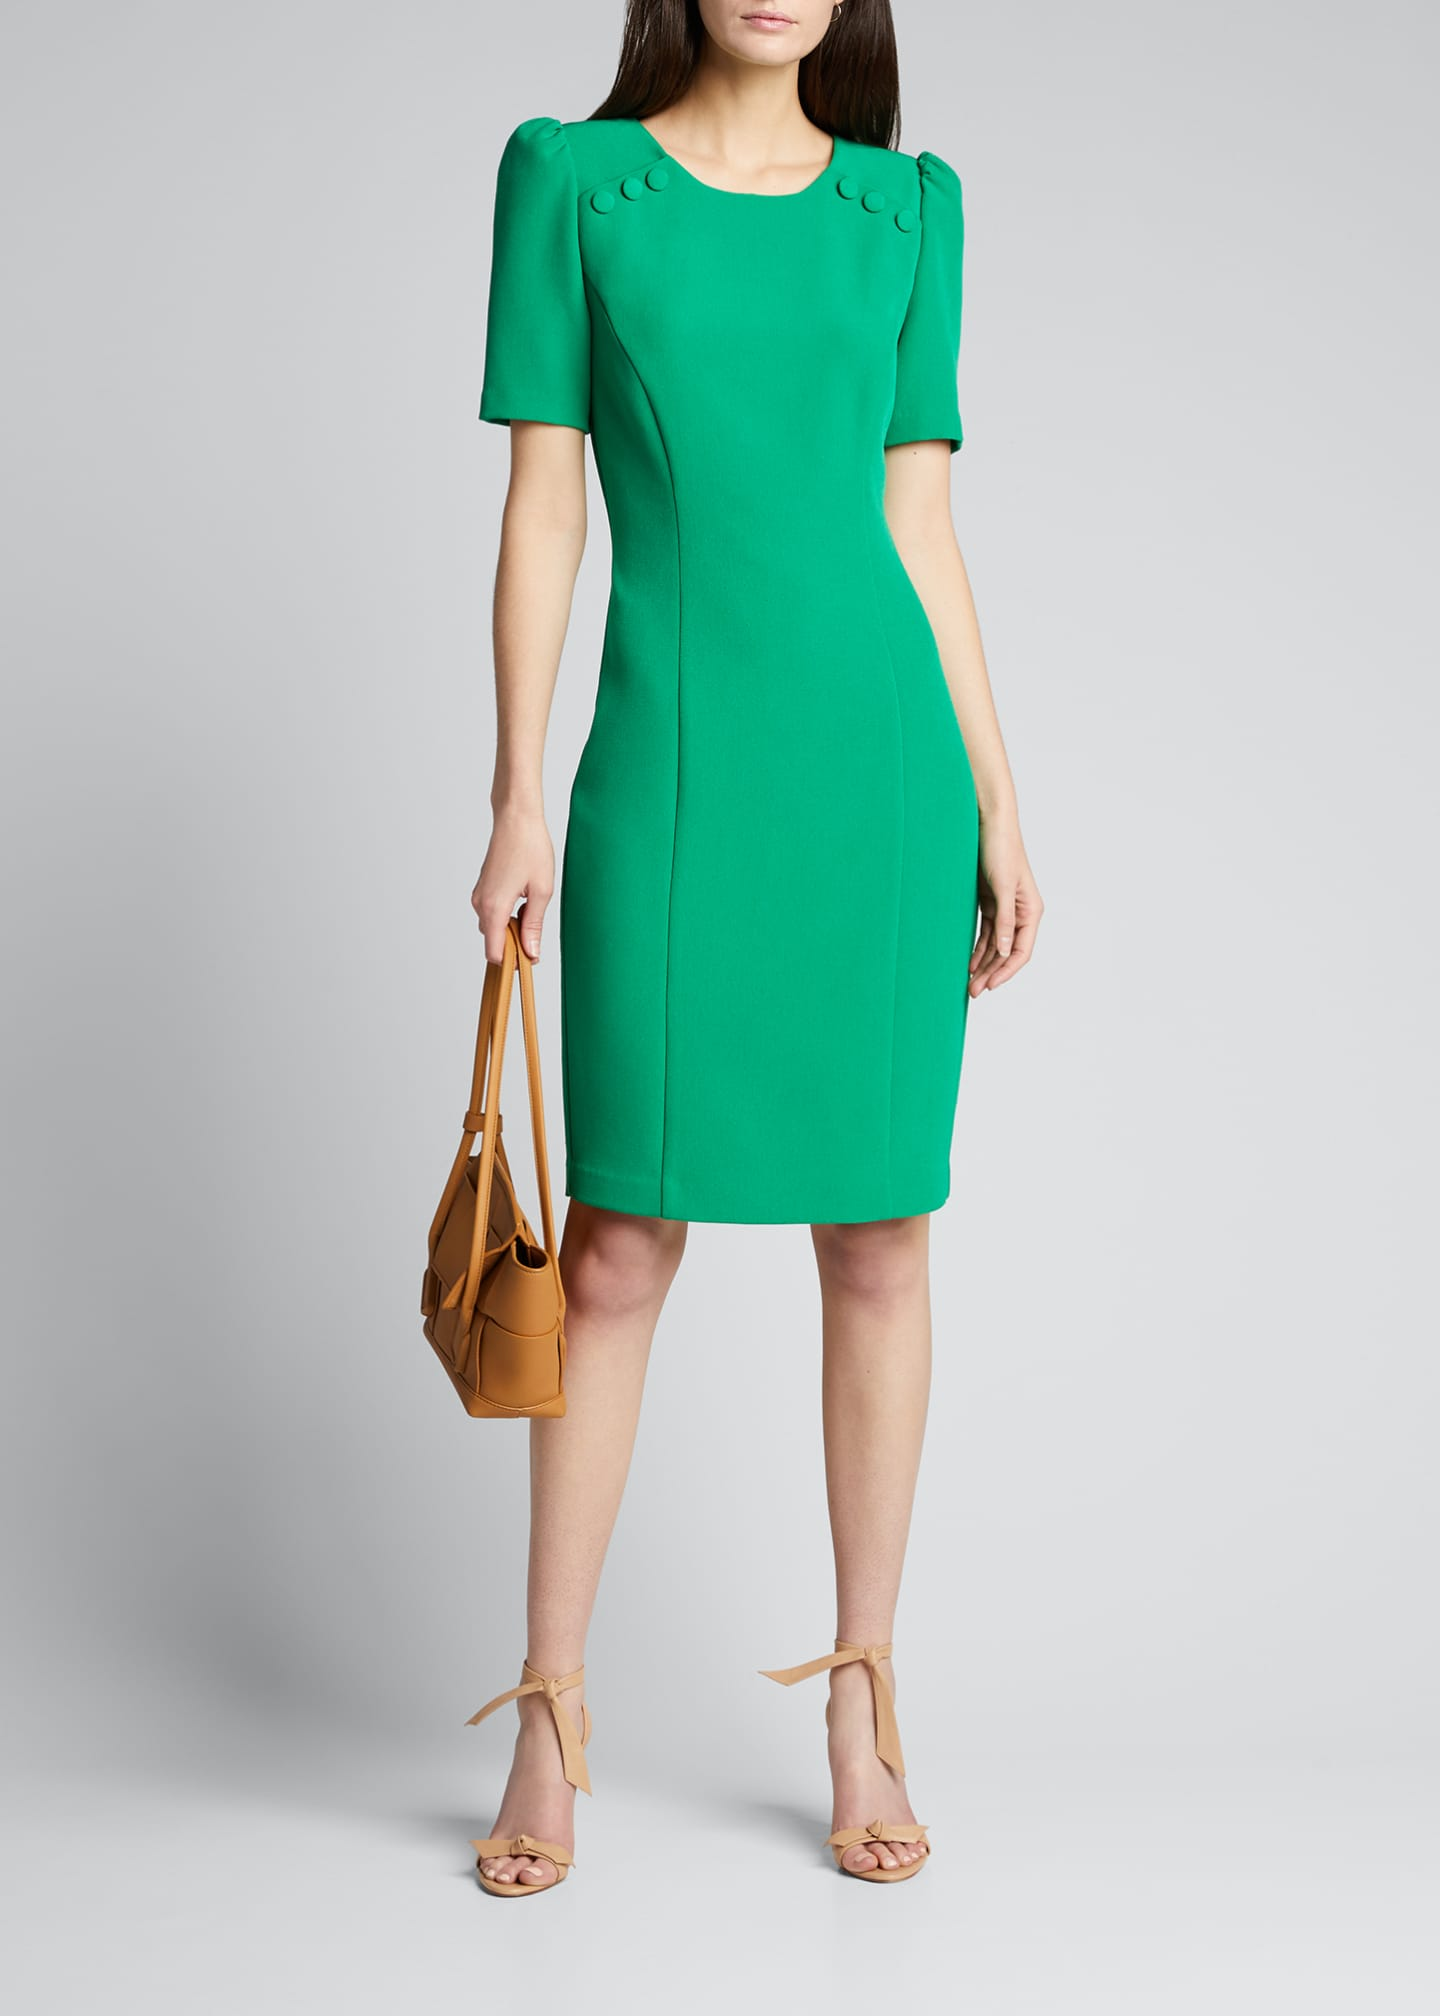 Badgley Mischka Collection Short-Sleeve Sheath Dress w/ Buttons